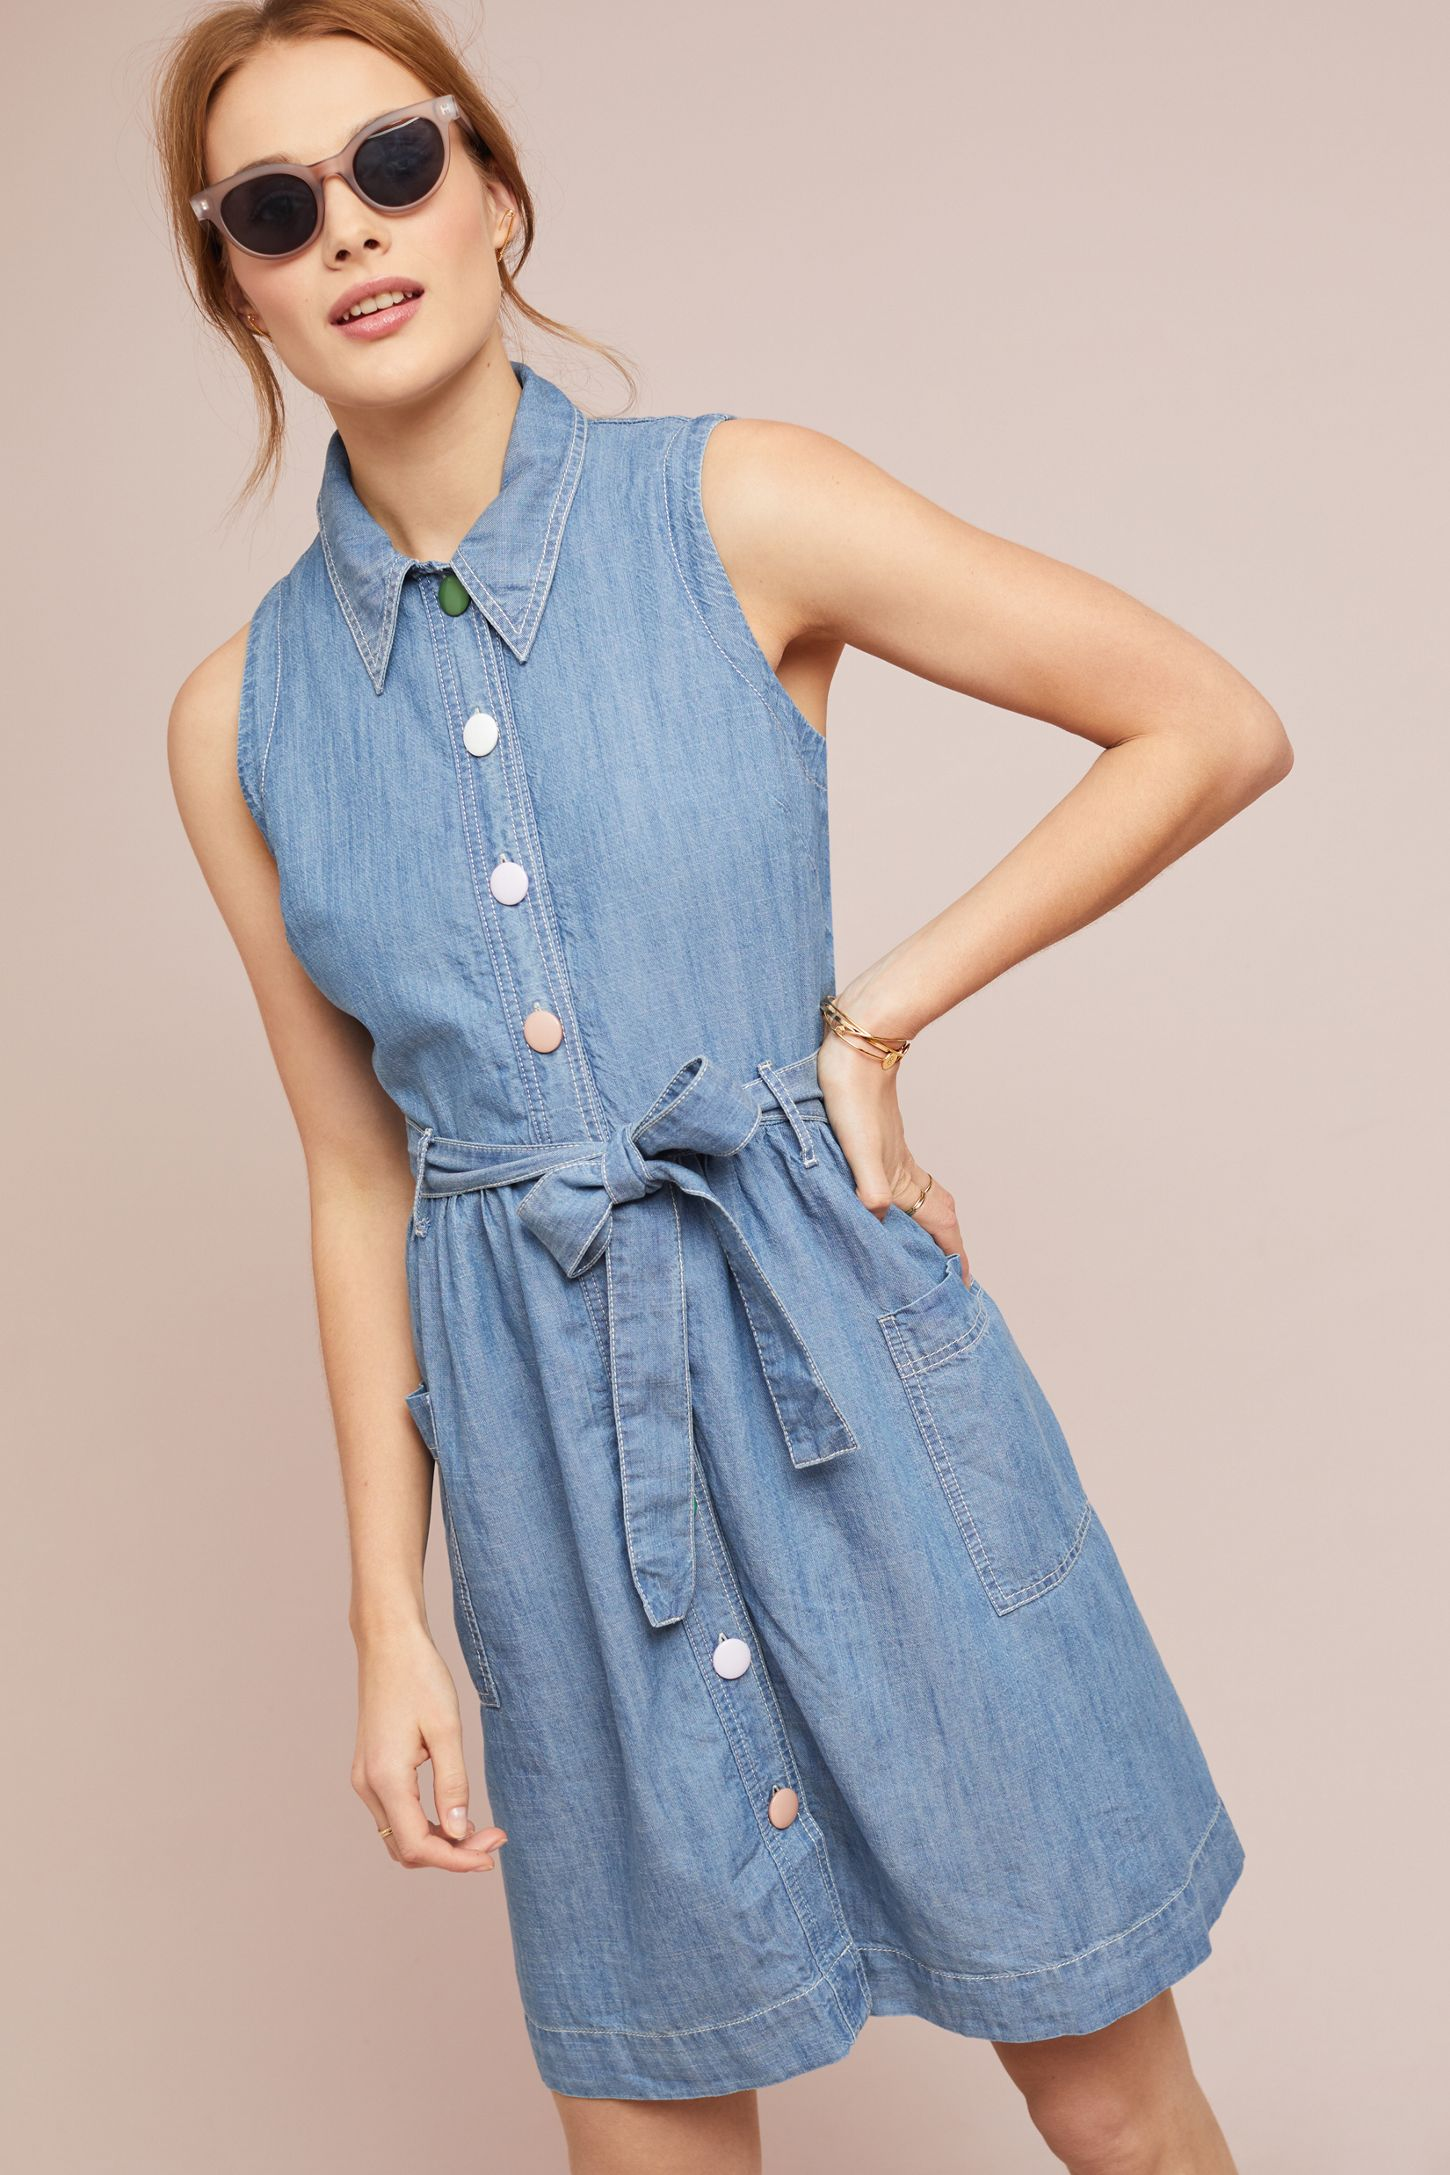 570cfb02eea Denim Shirt Dress With Pockets - Ortsplanungsrevision Stadt Thun